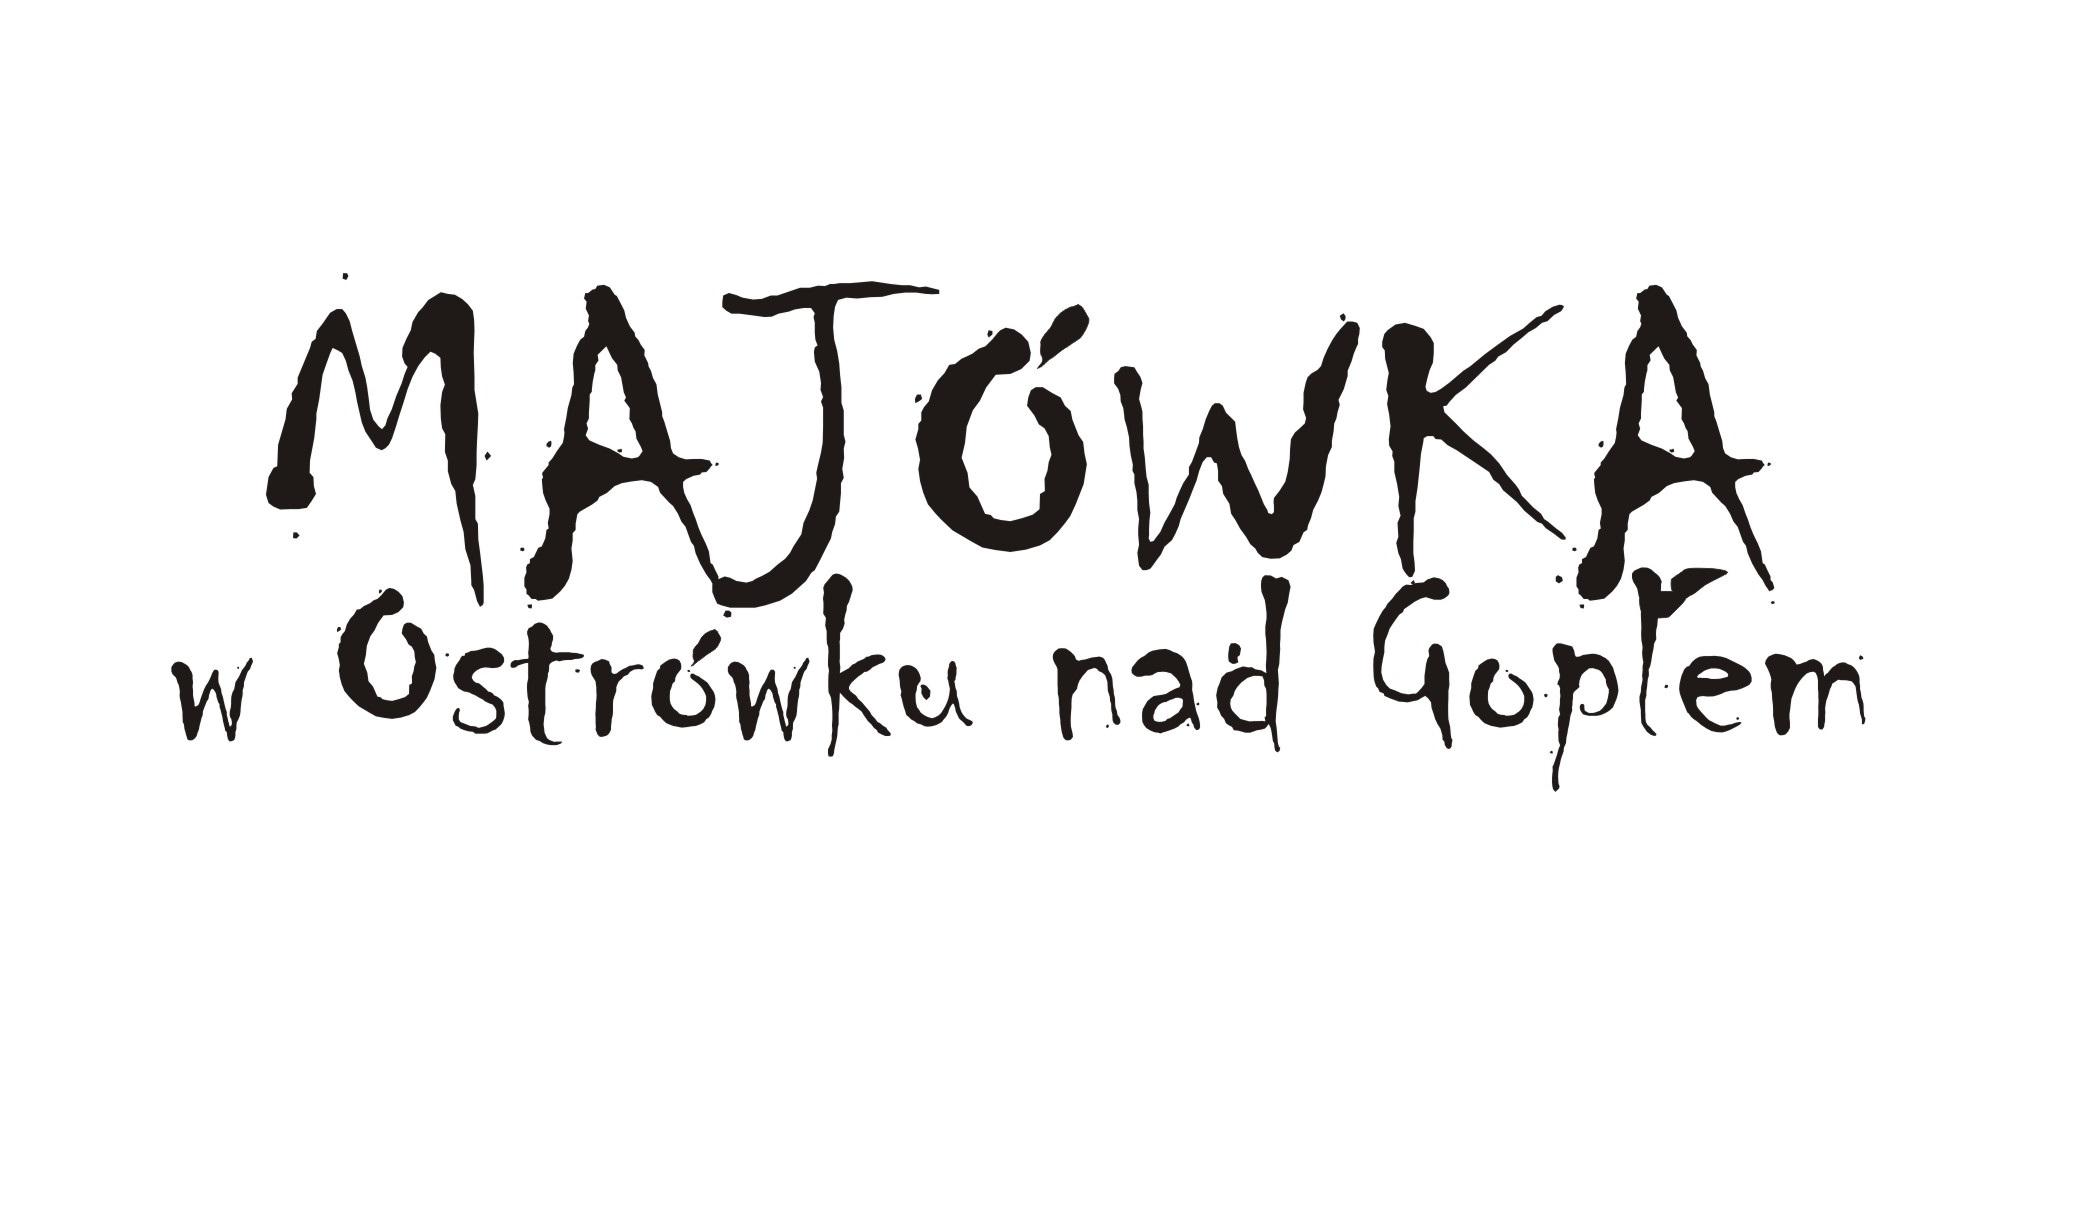 Majówka w Ostrówku nad Gopłem